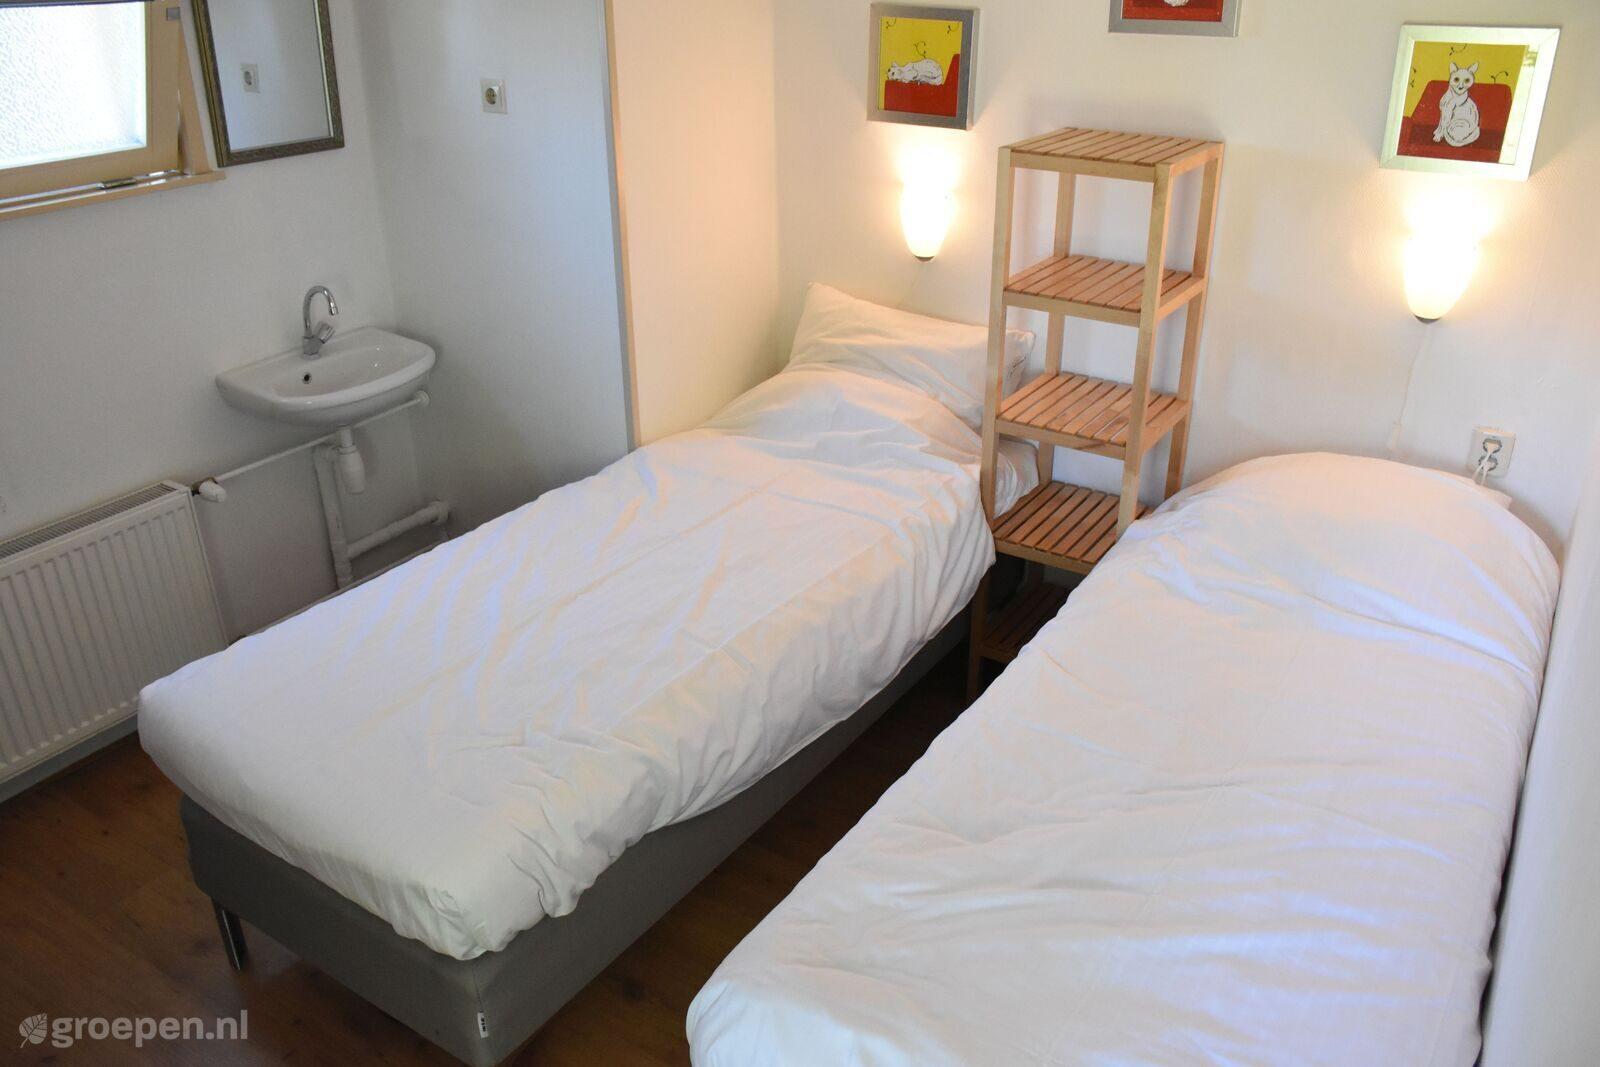 Group accommodation Vorden